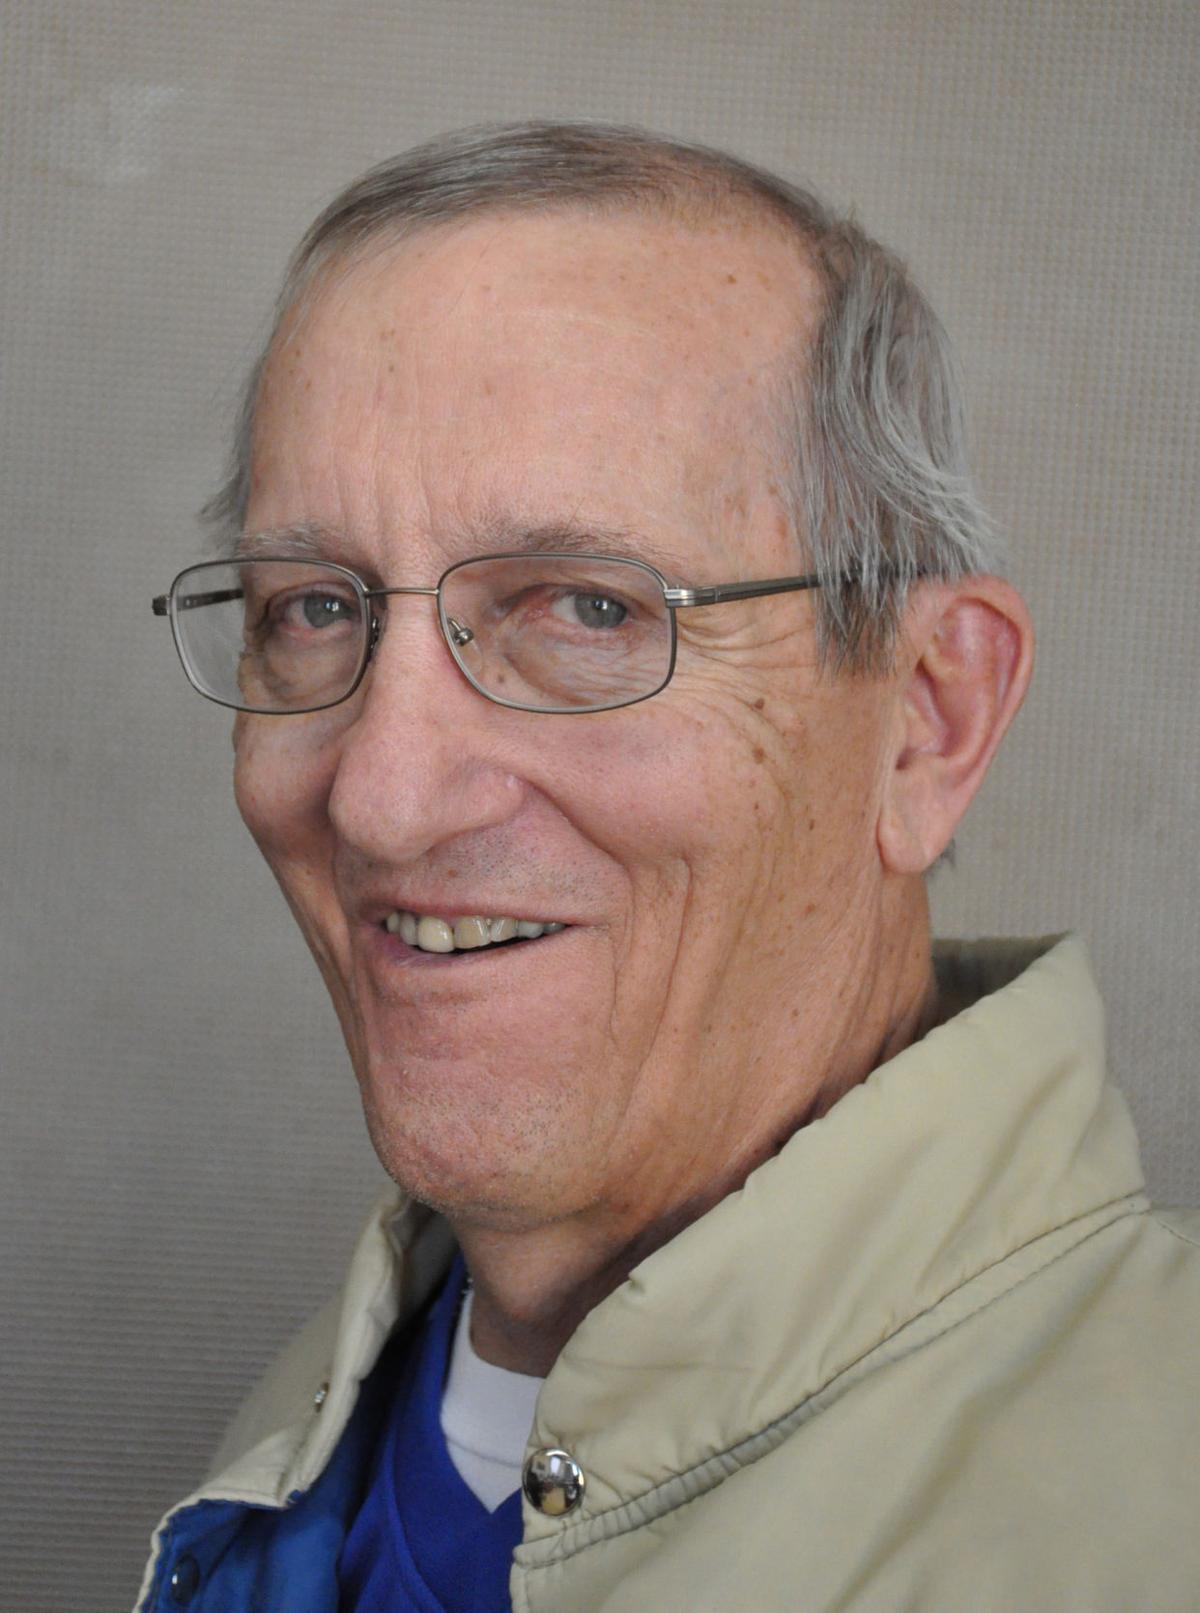 Gary Grovesteen